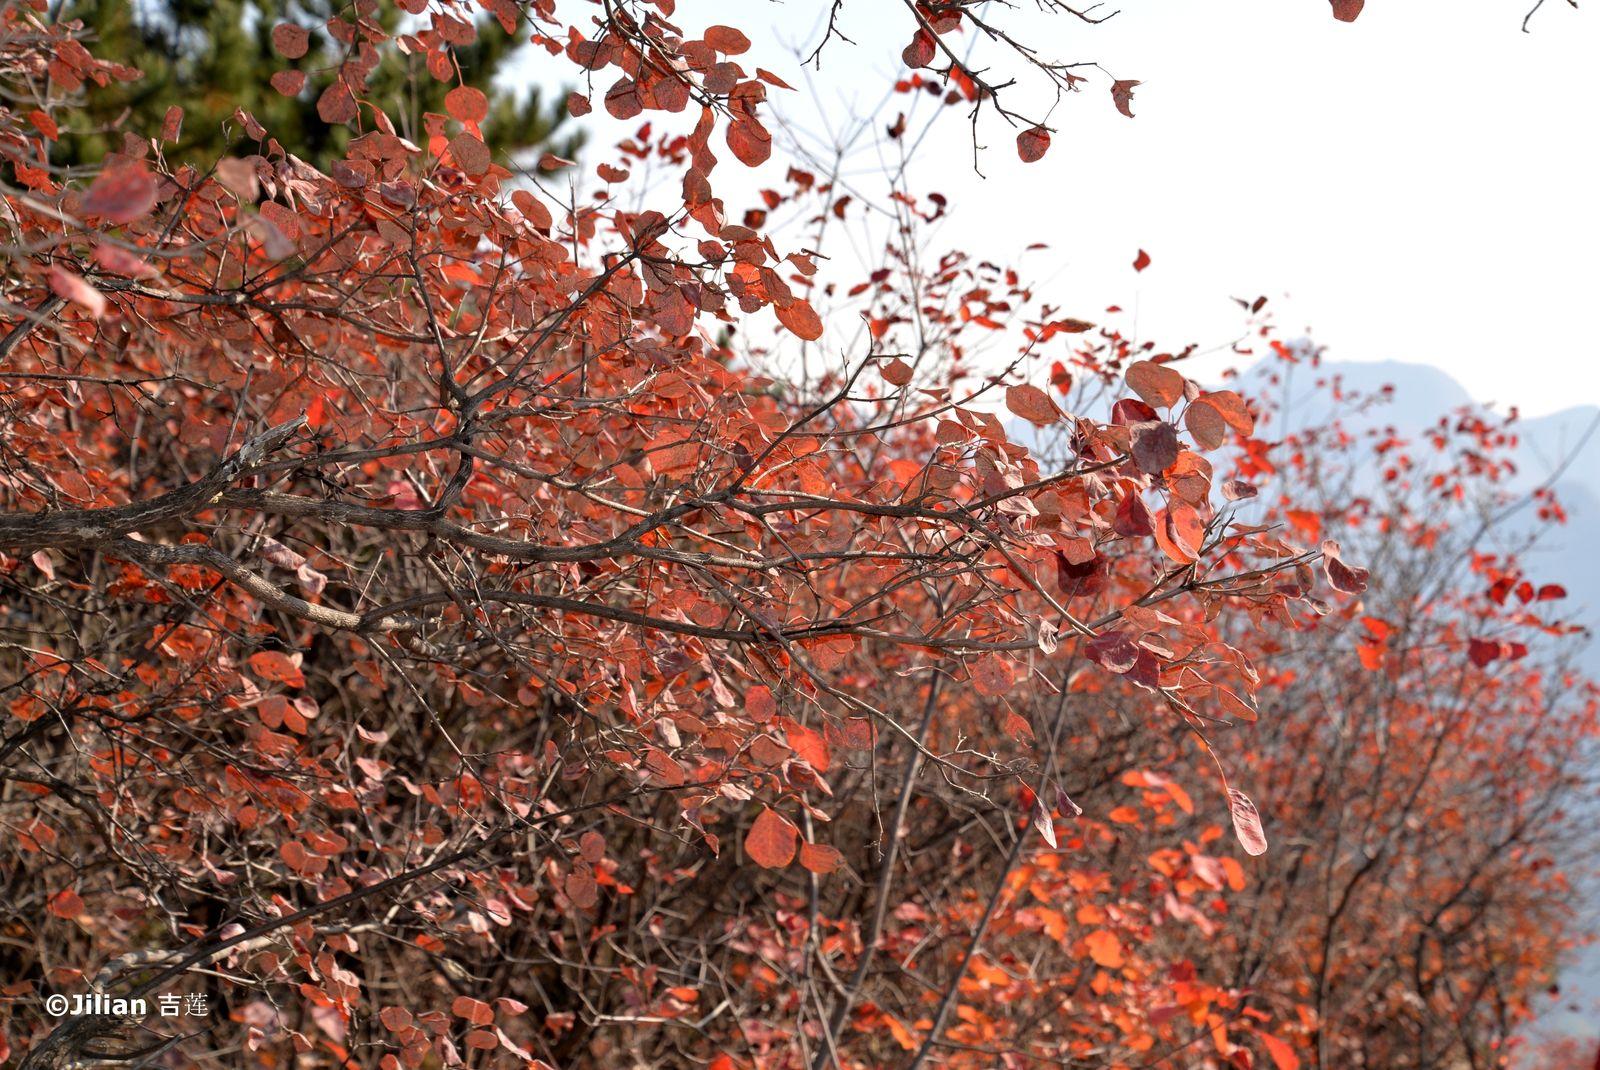 L'automne multicolore à Zhoukoudian – 周口店五彩的秋天